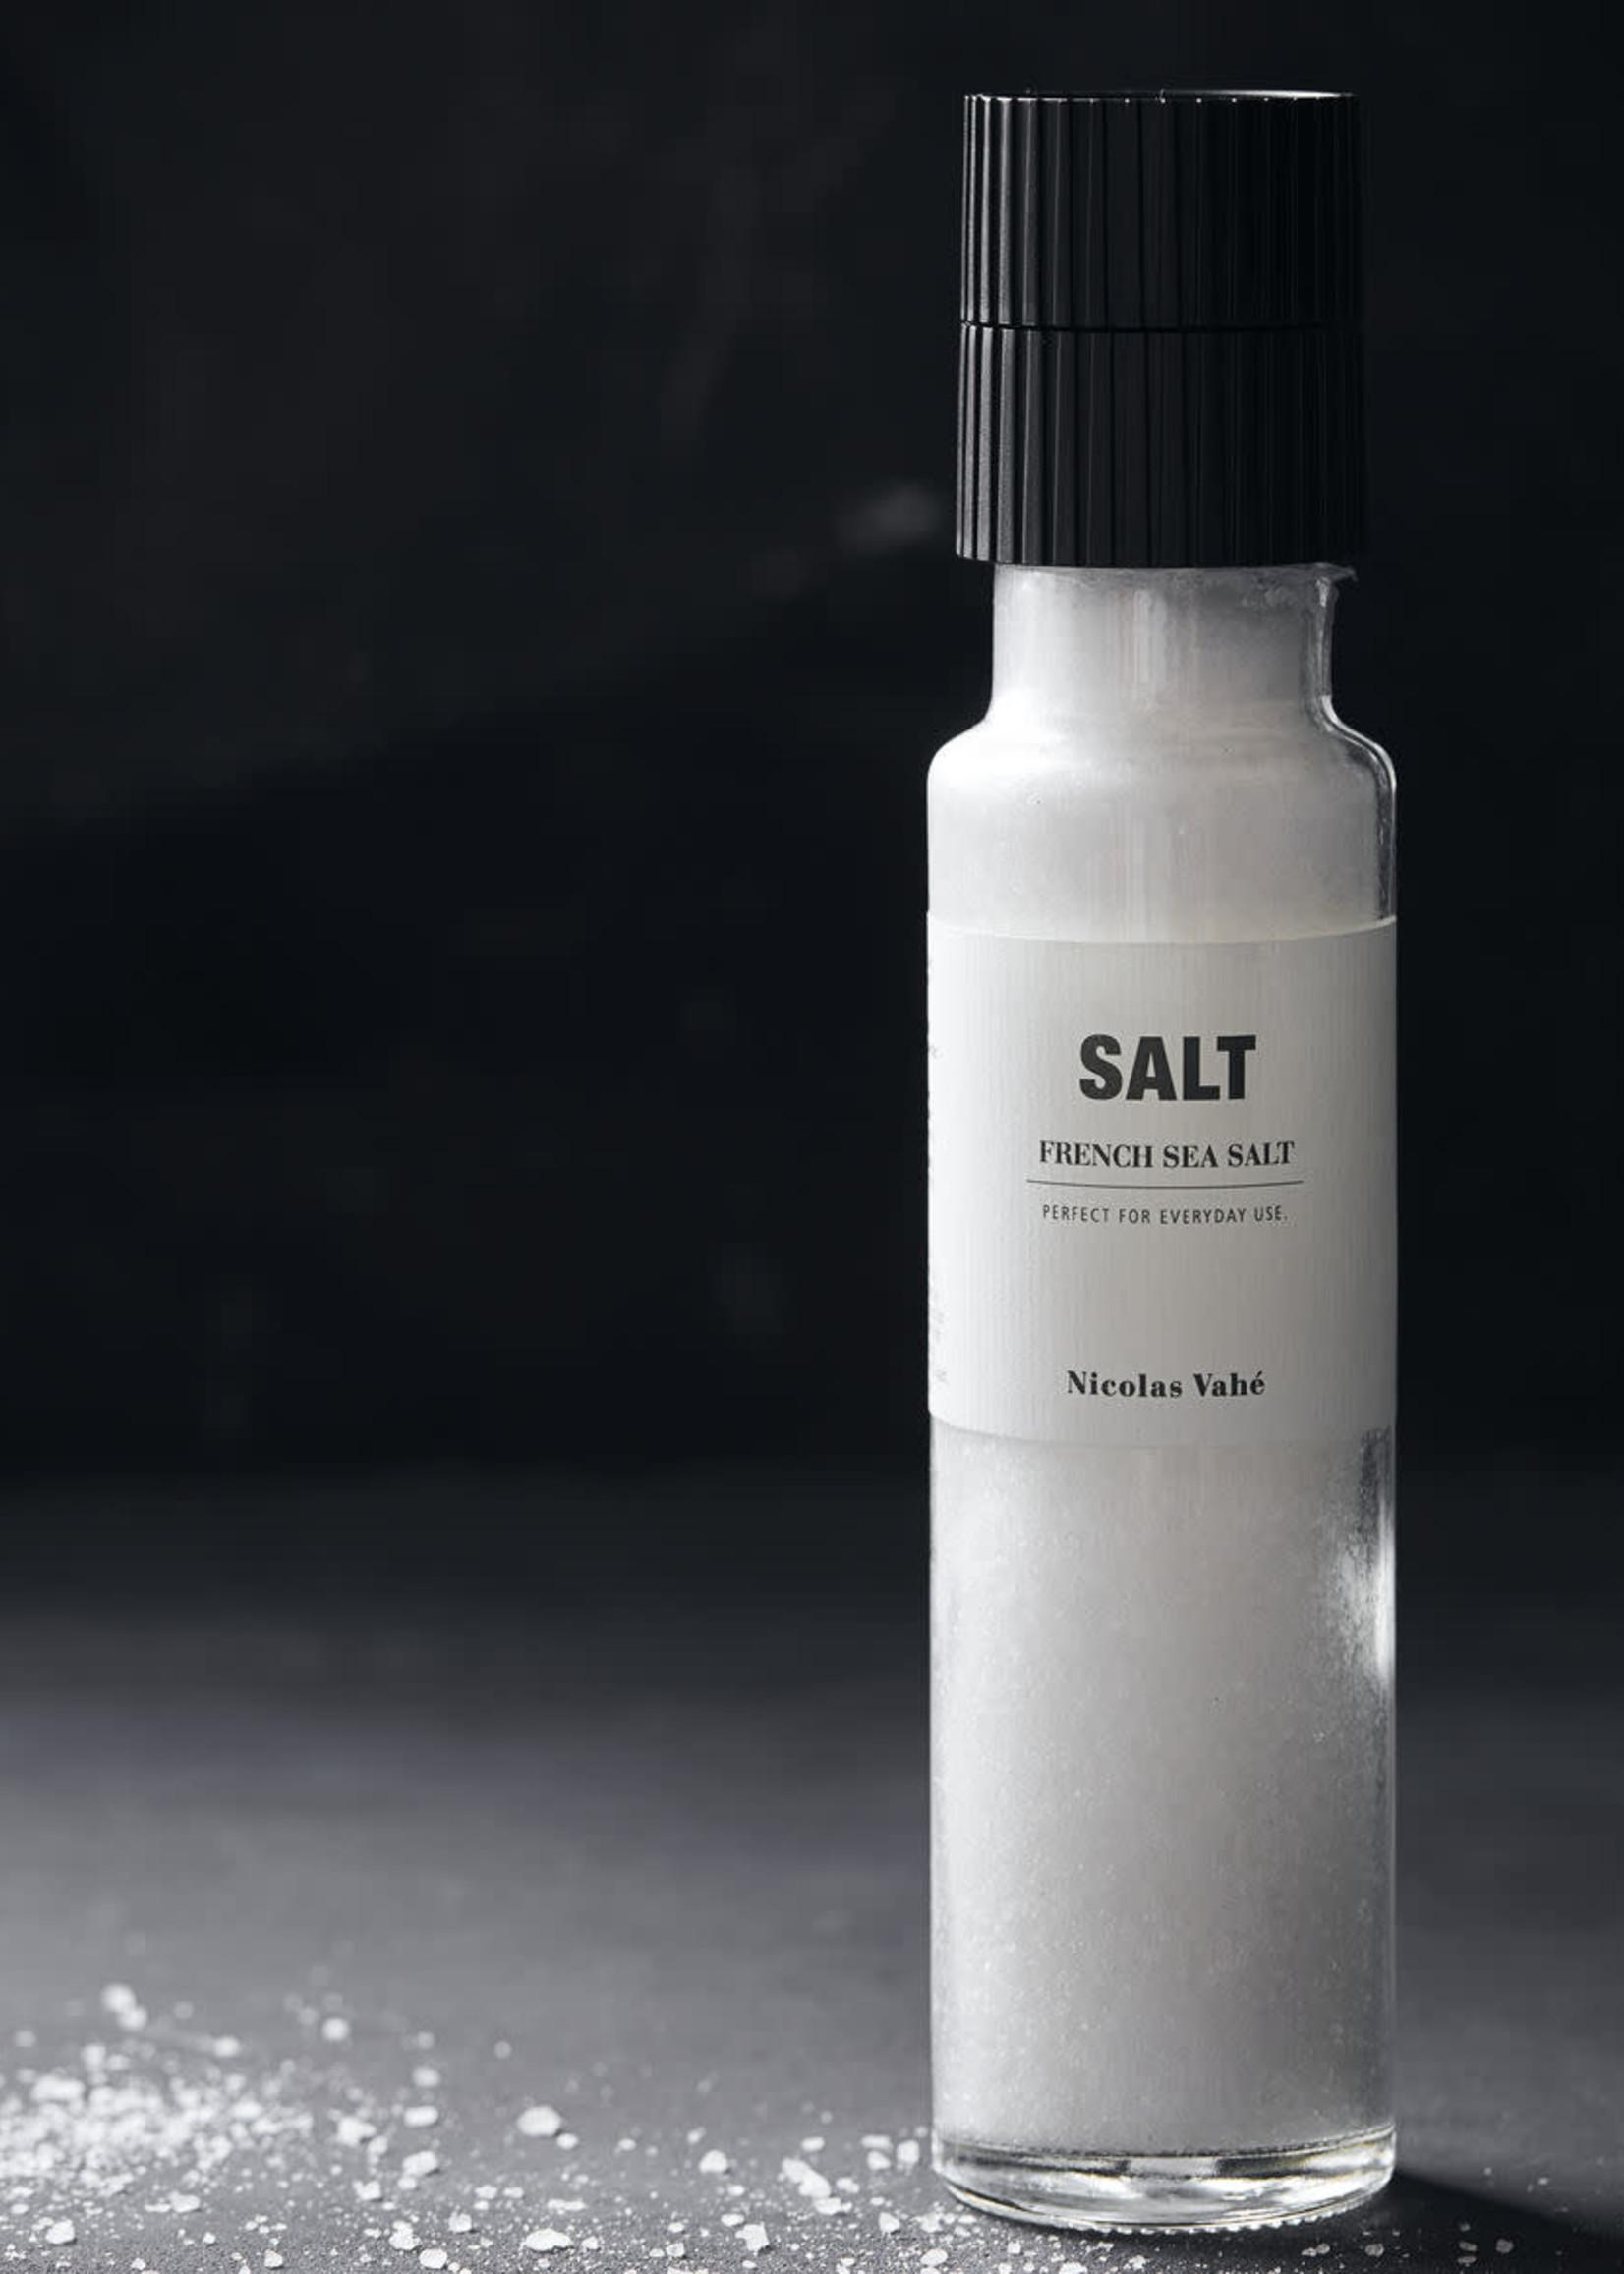 Nicolas Vahé Nicolas Vahe Salt, French Sea